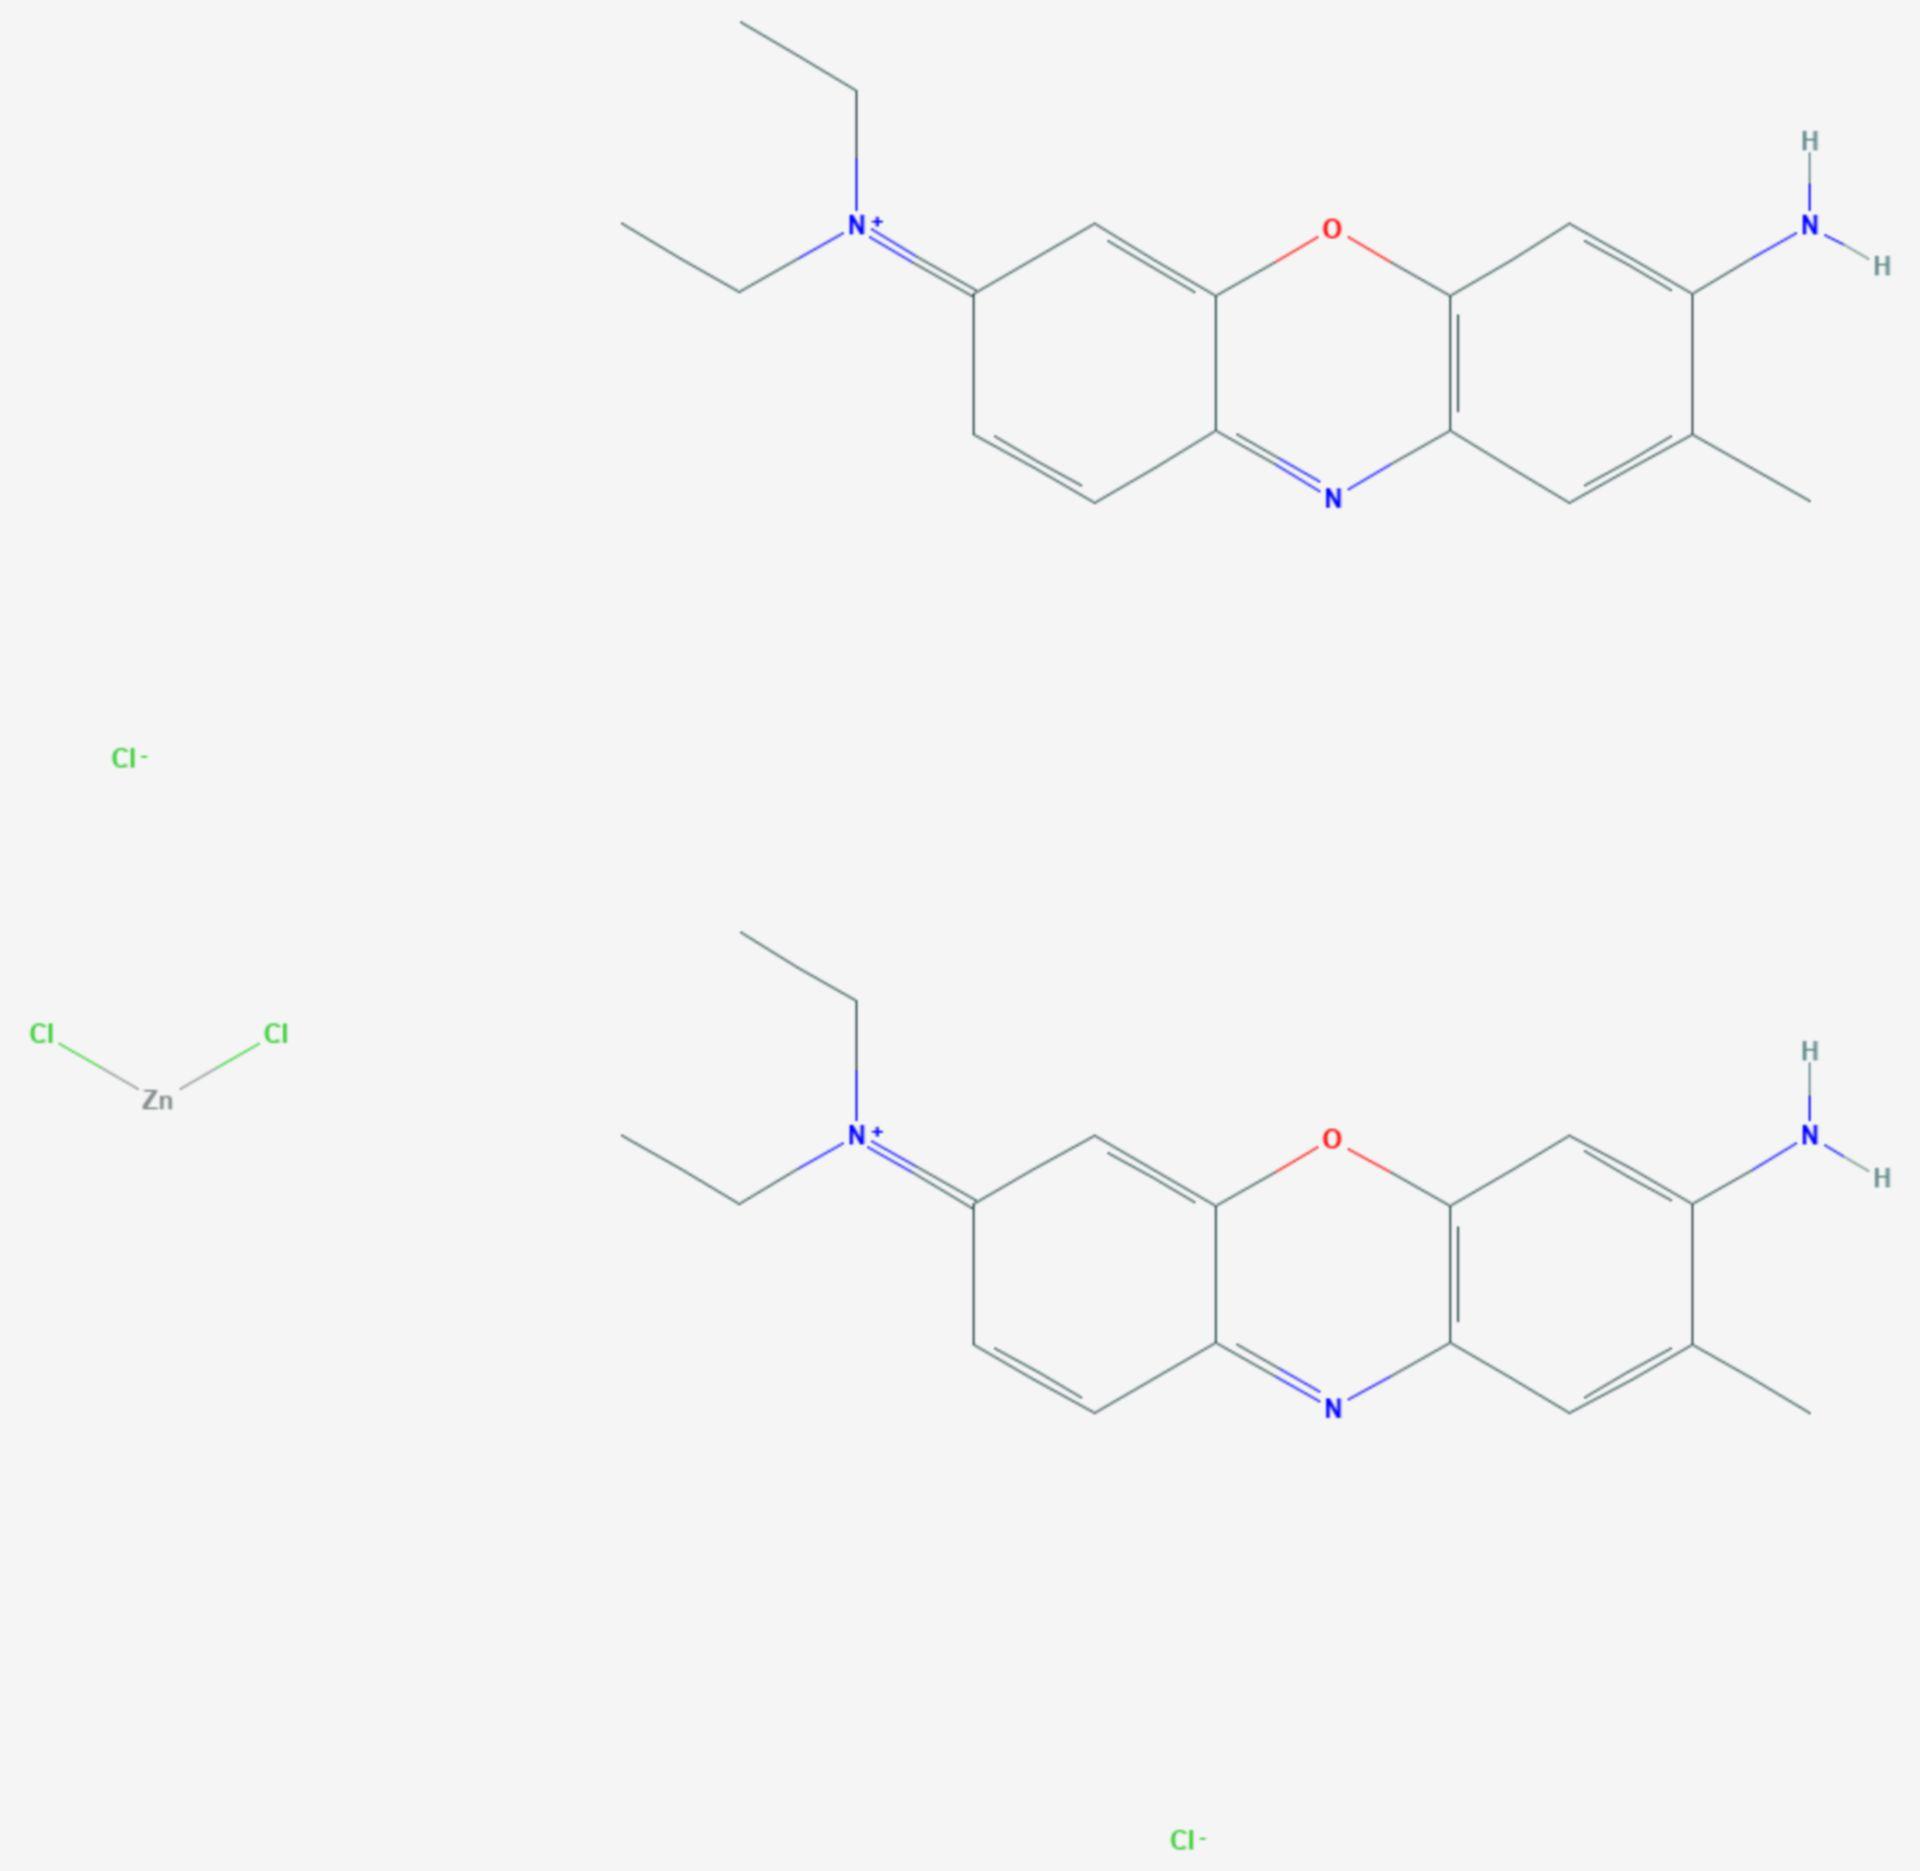 Brillantkresylblau (Strukturformel)